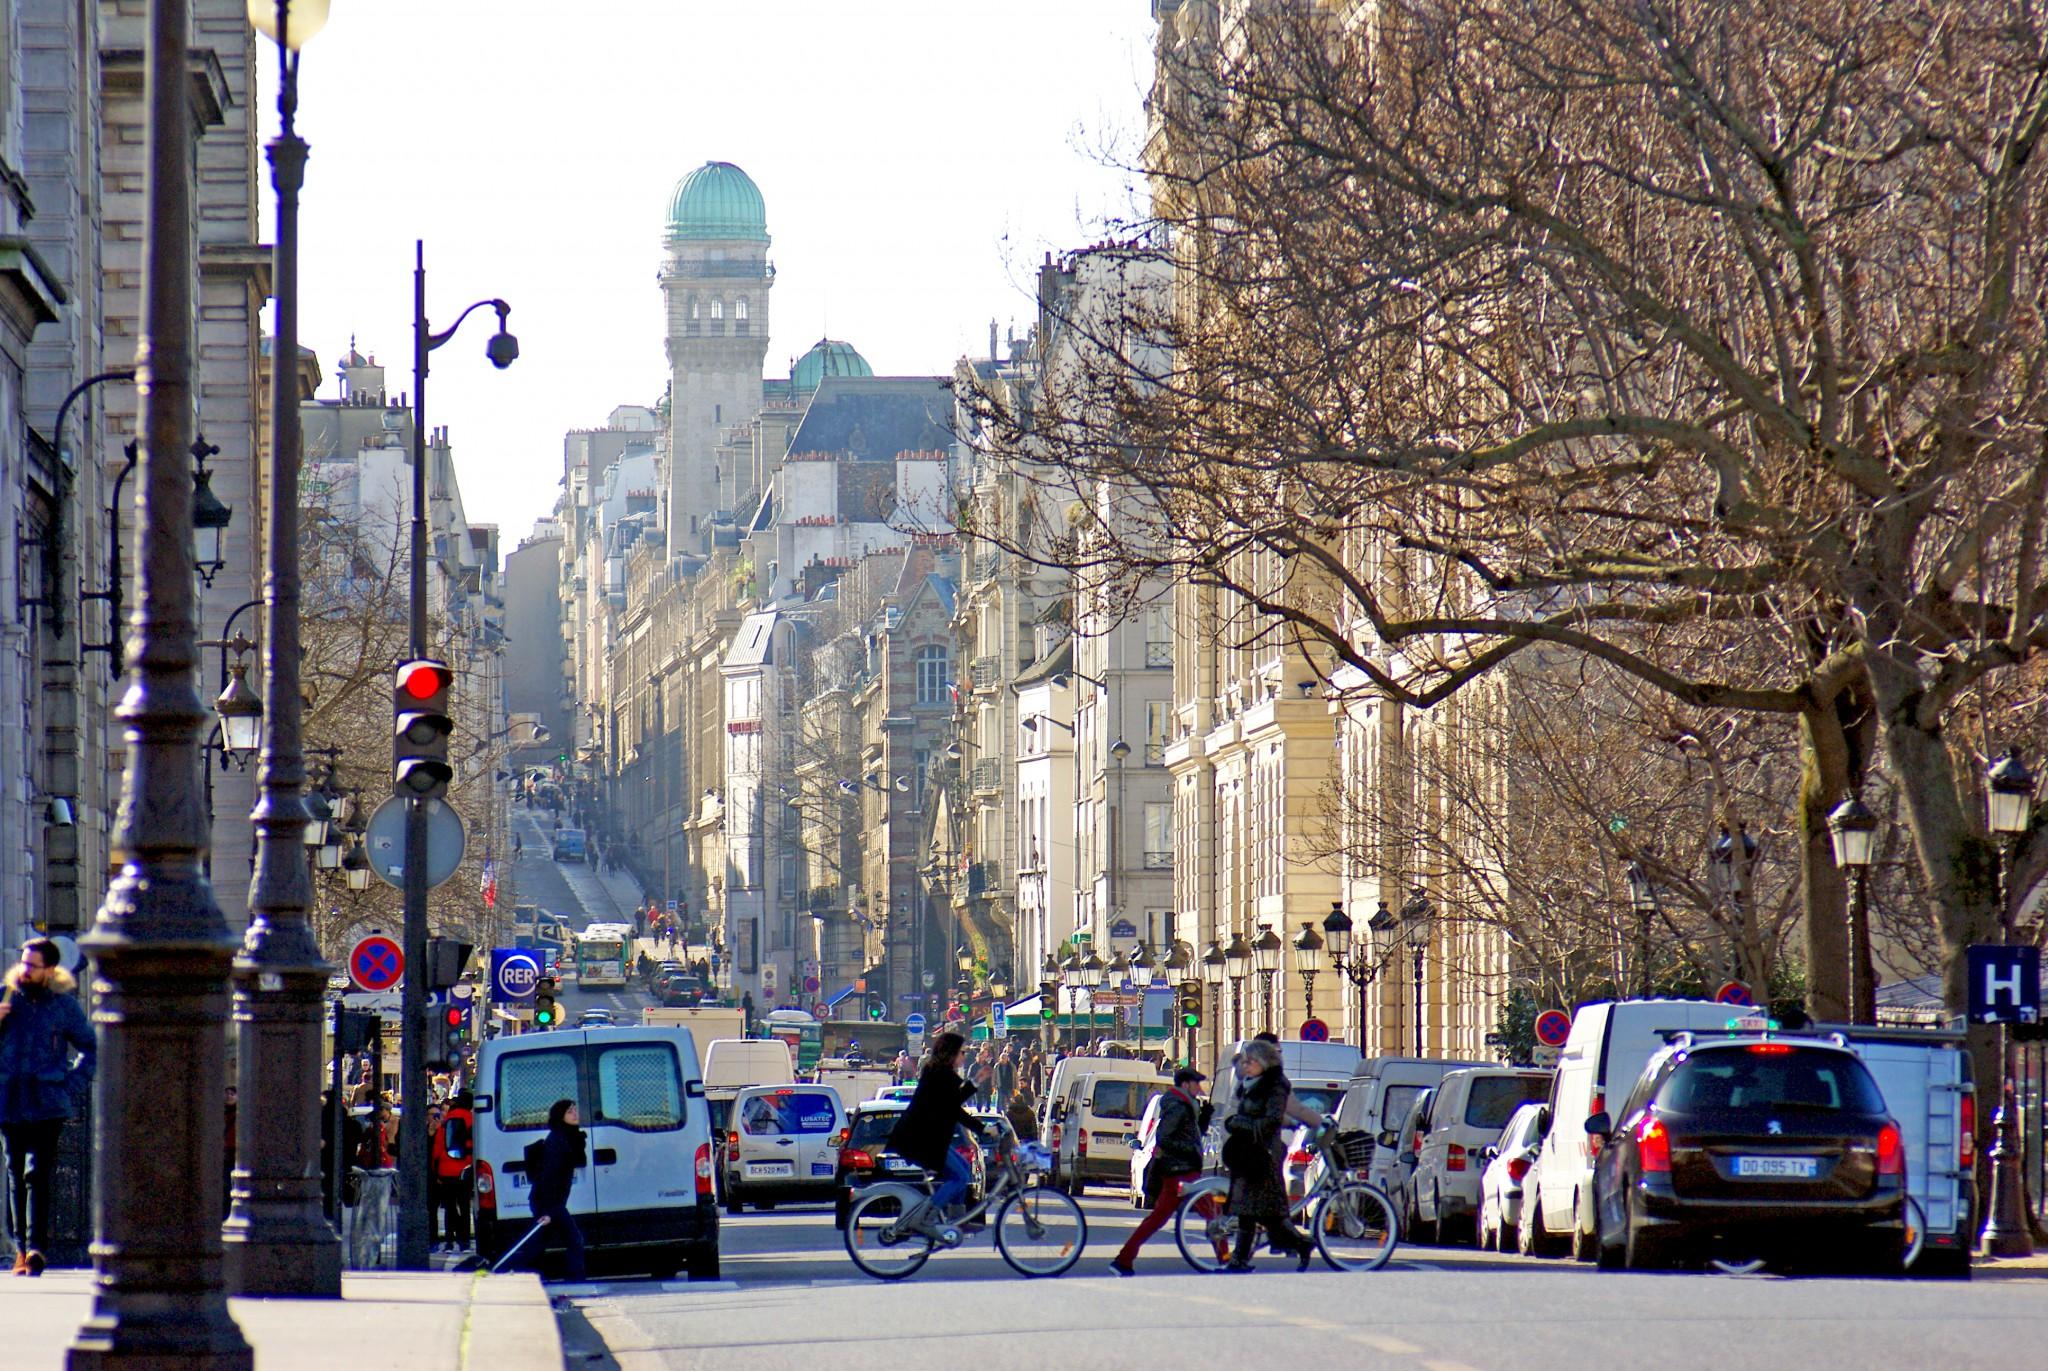 rue saint jacques paris oldest street french moments. Black Bedroom Furniture Sets. Home Design Ideas